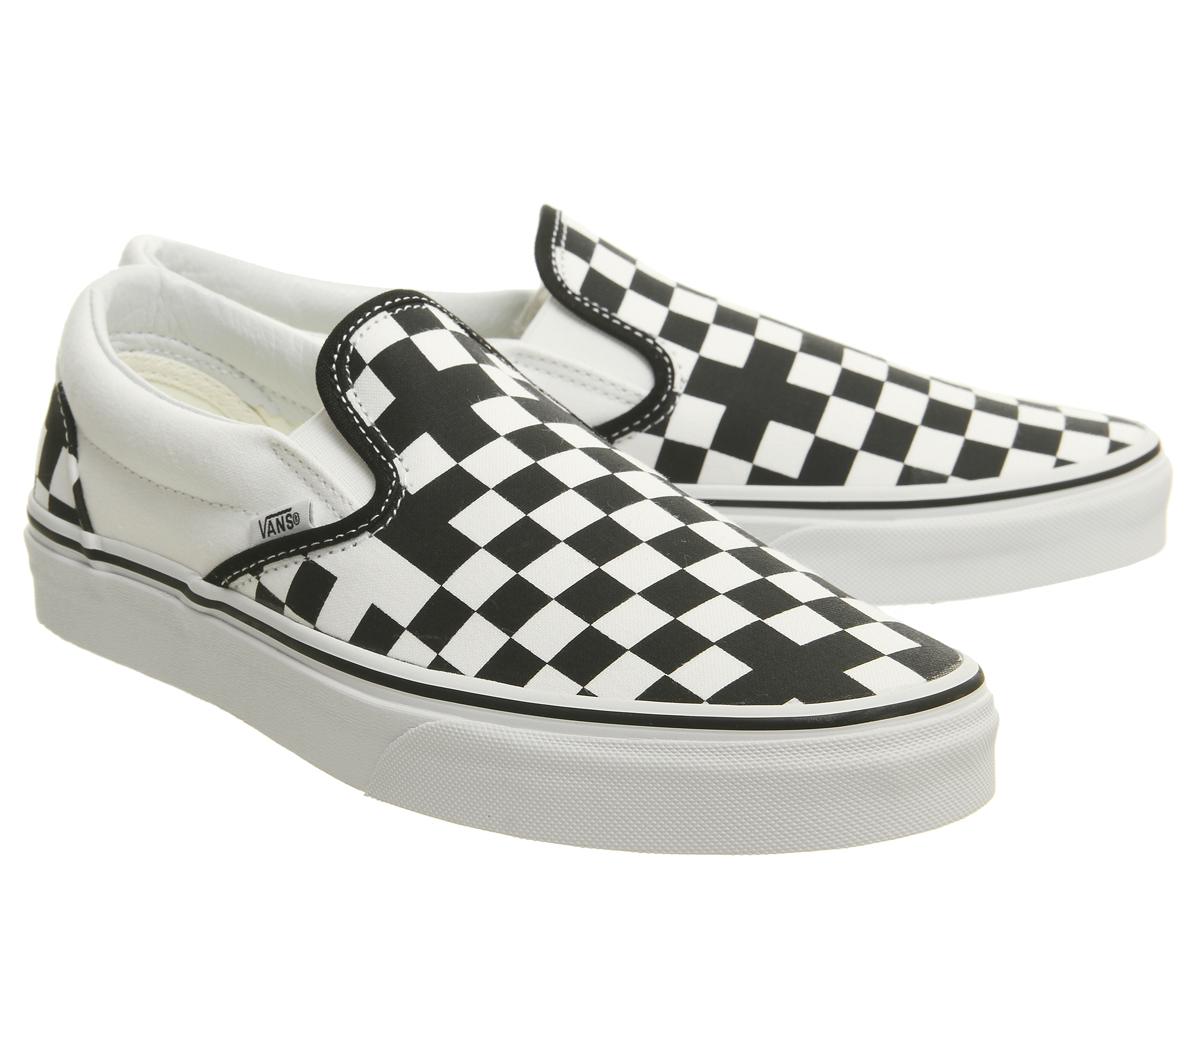 df52d081f6f07c Mens Vans Vans Classic Slip On Trainers Geometric Black True White ...